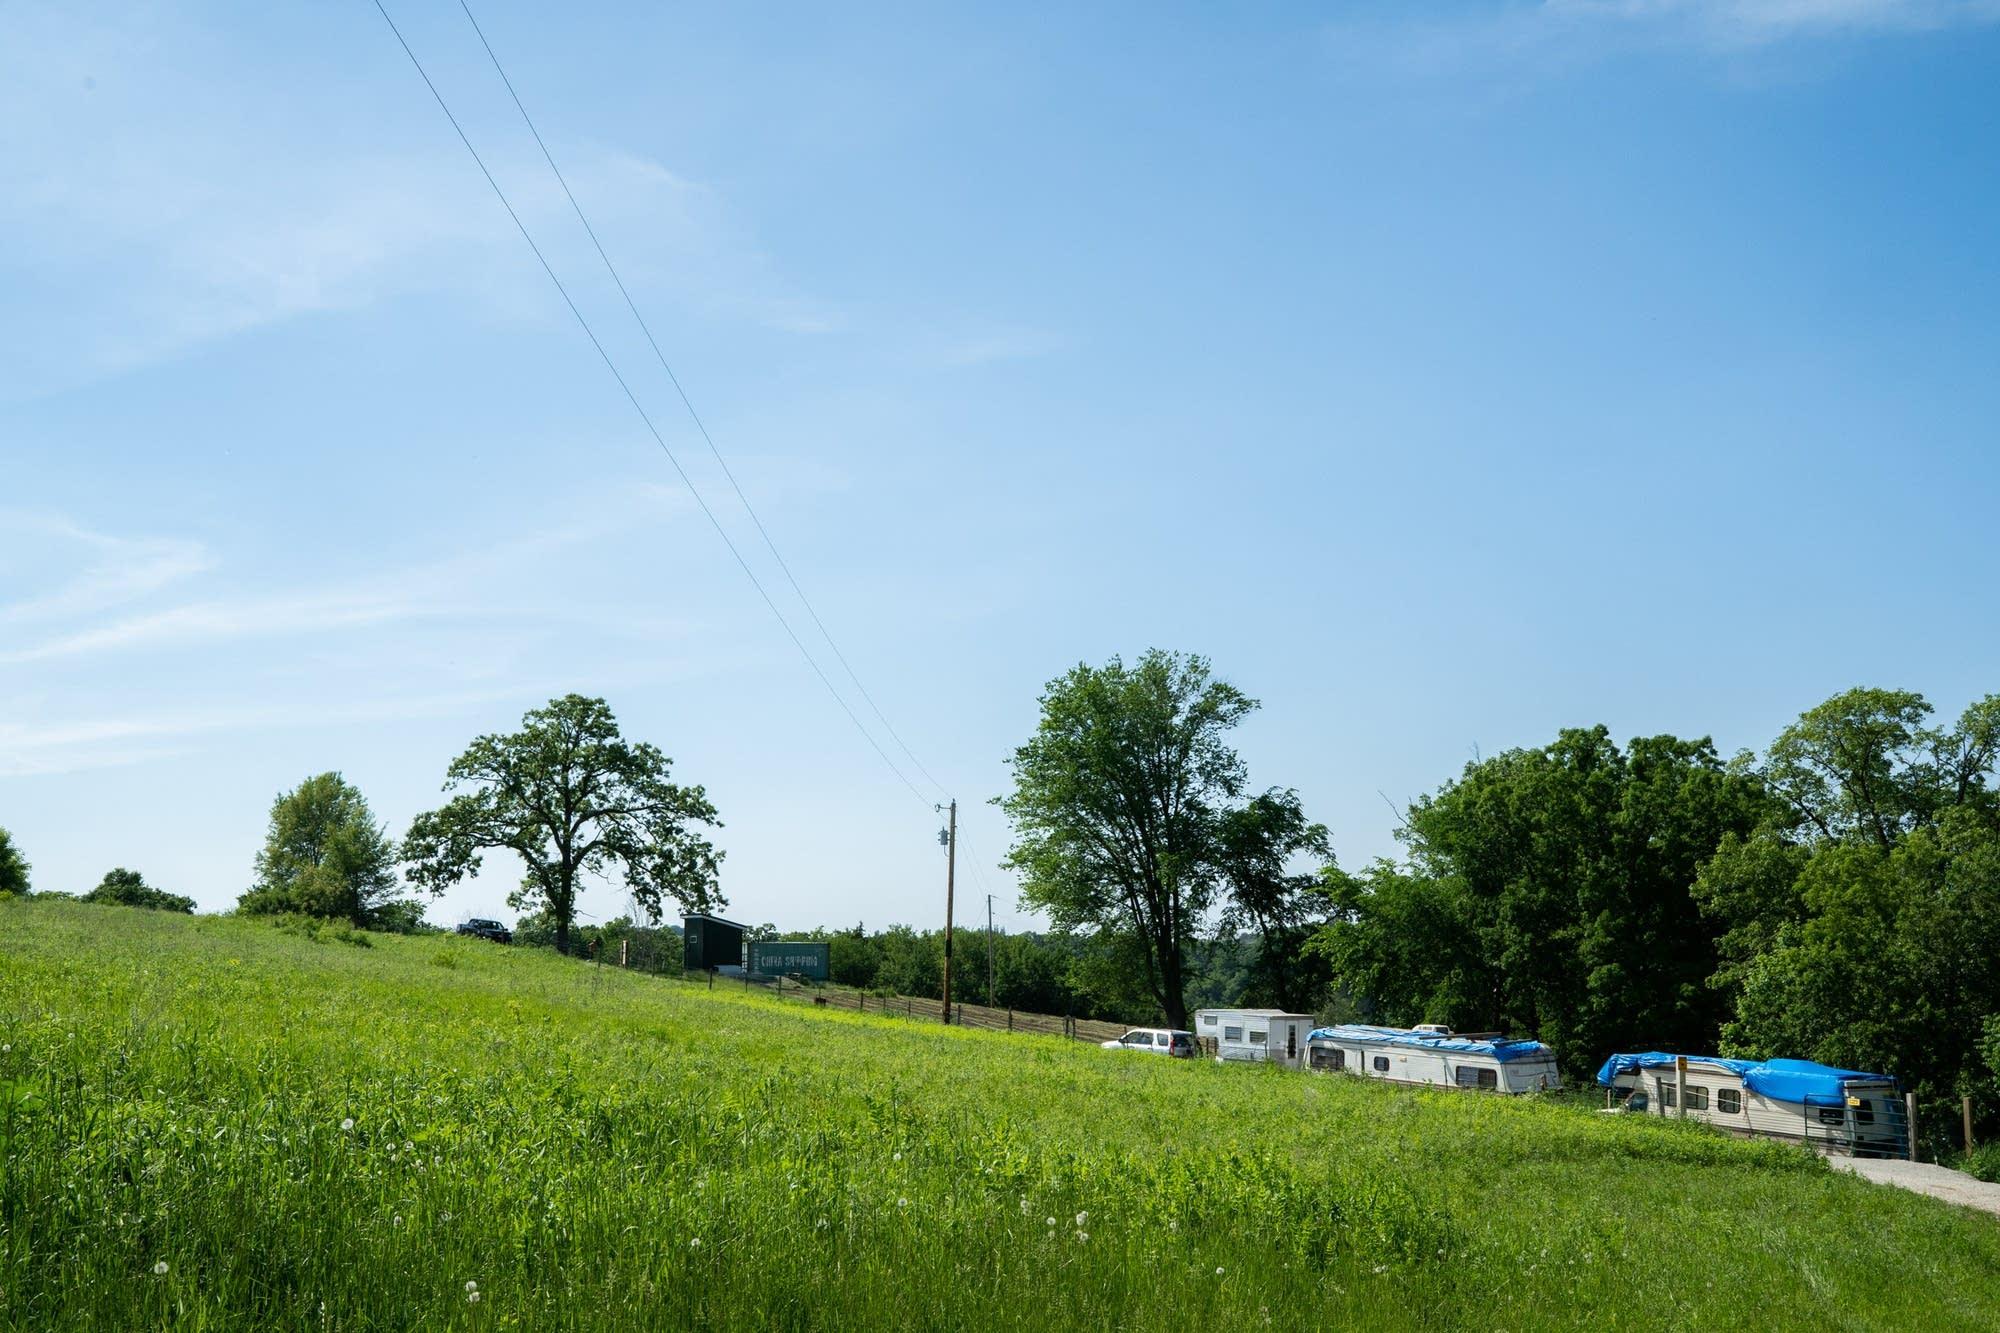 The hemp farm 5th Sun Gardens can be seen from the road.